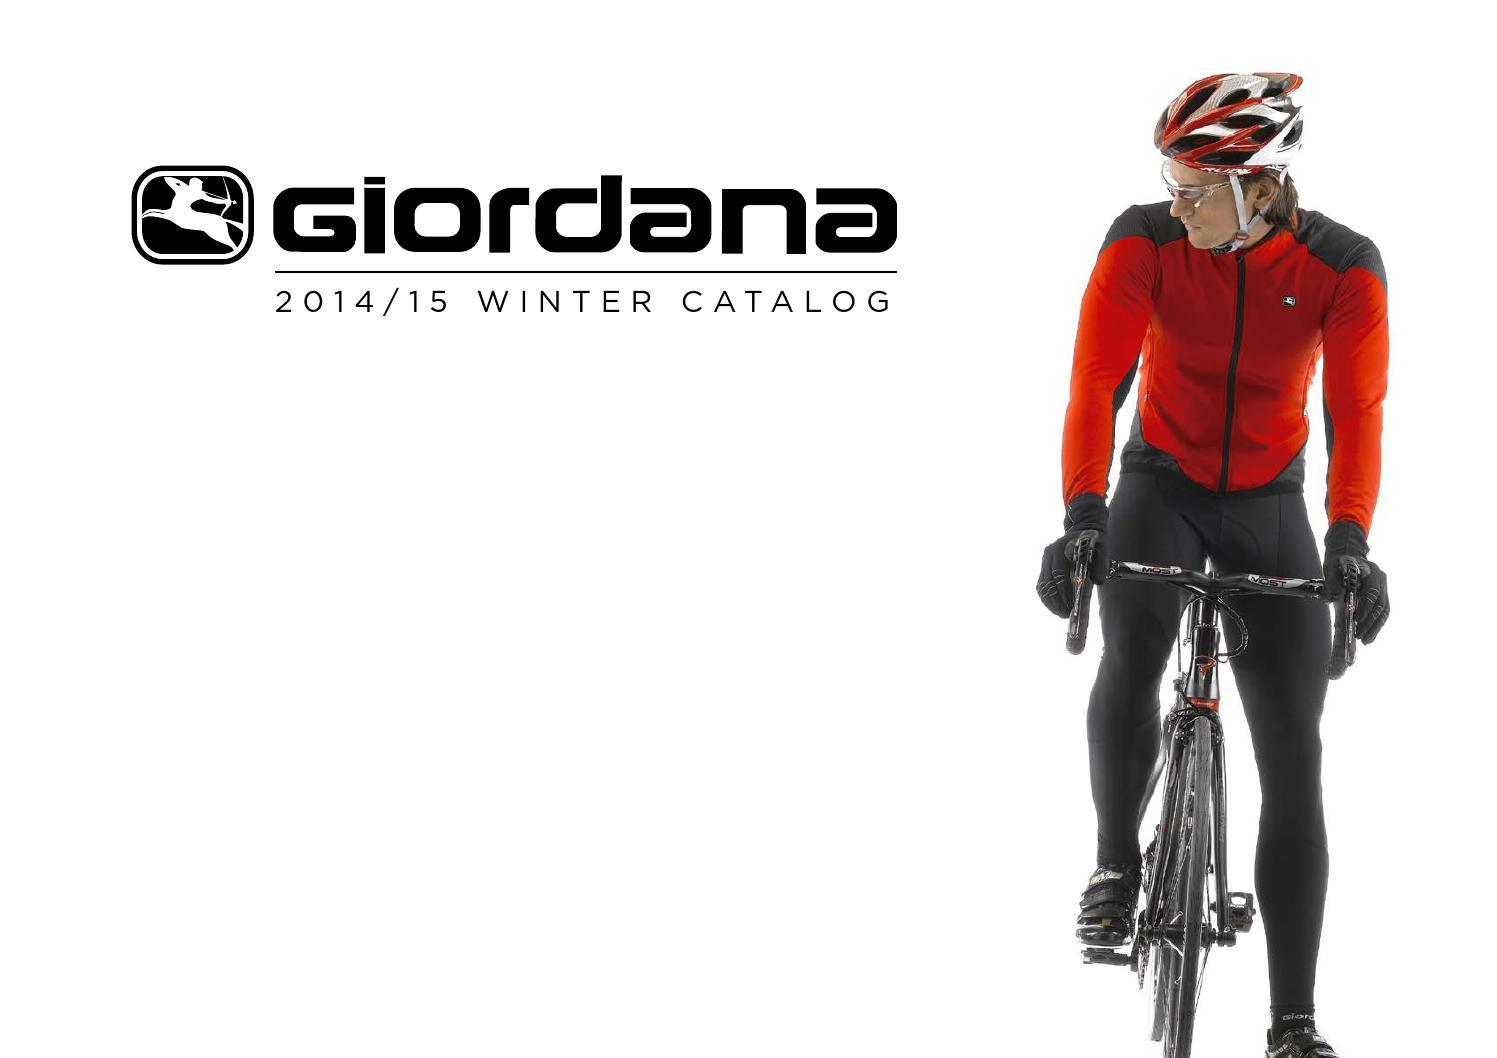 535e2956f0b6 Giordana 2015 Winter Catalog by Giordana Cycling - issuu